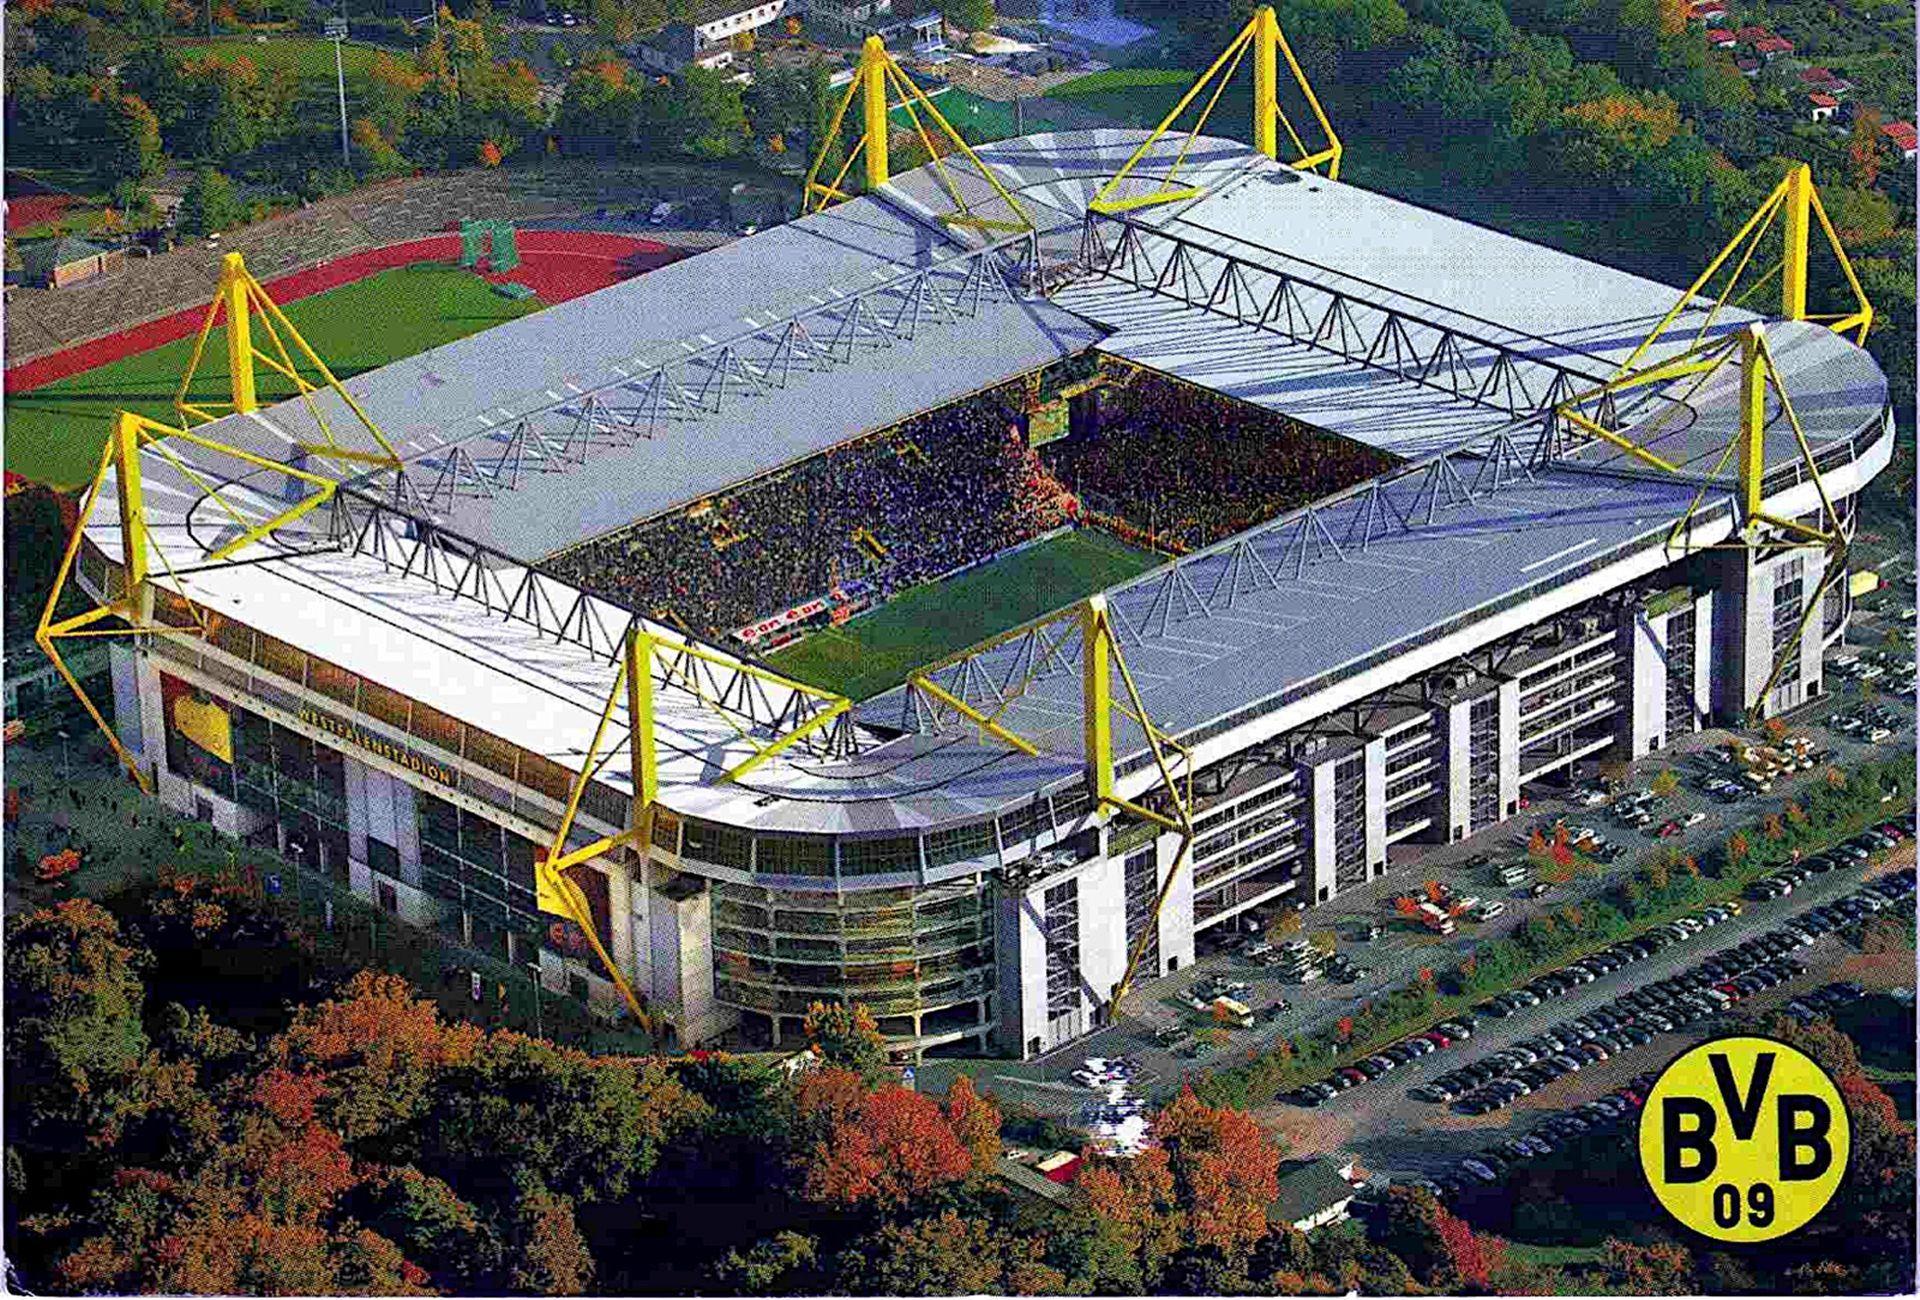 borussia dortmund westfallen stadion football ground tyskland pinterest. Black Bedroom Furniture Sets. Home Design Ideas